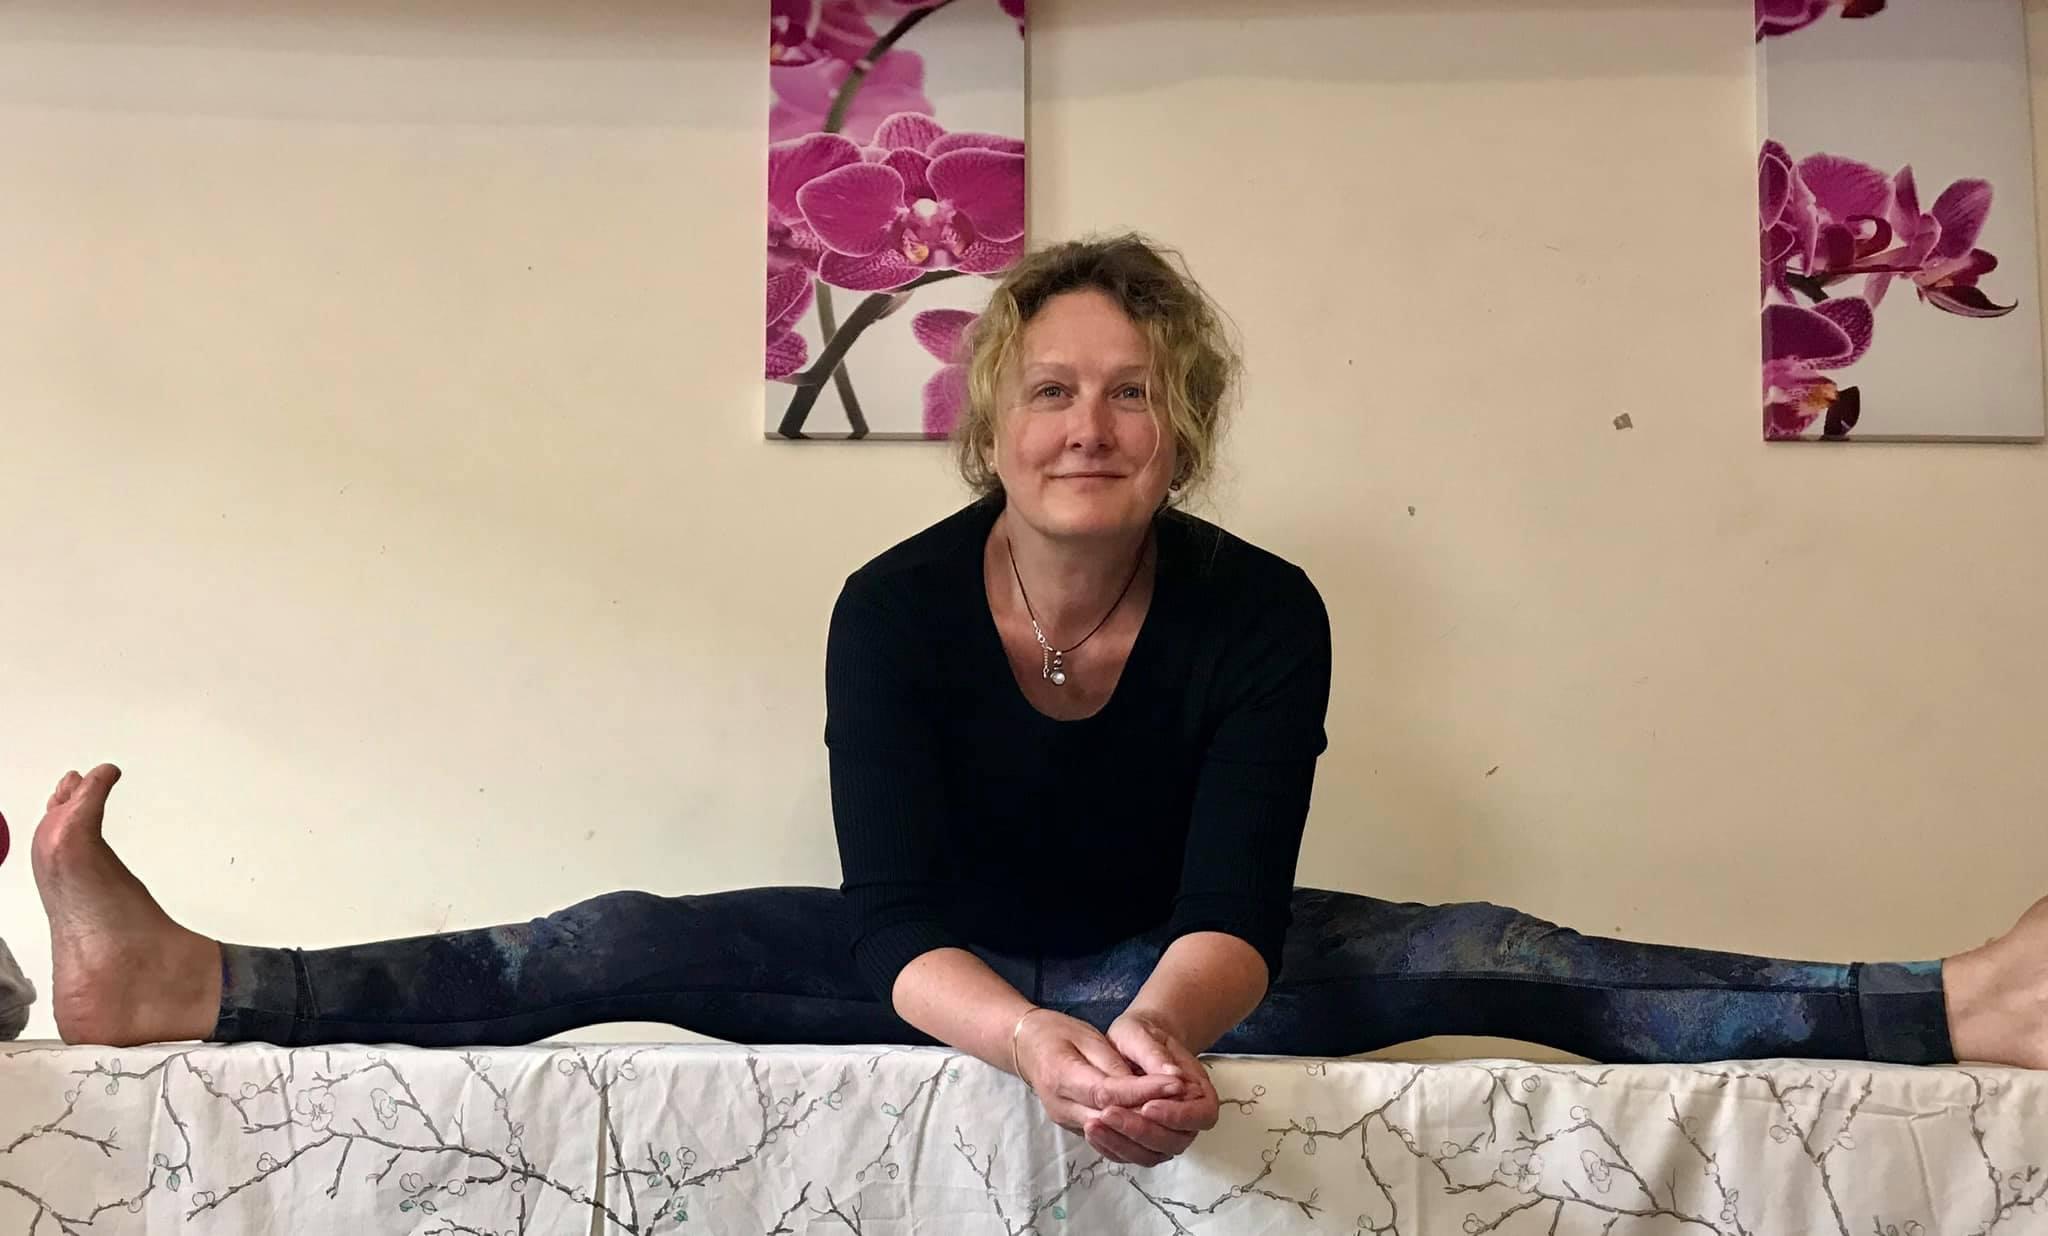 Christine Stewart in yoga pose